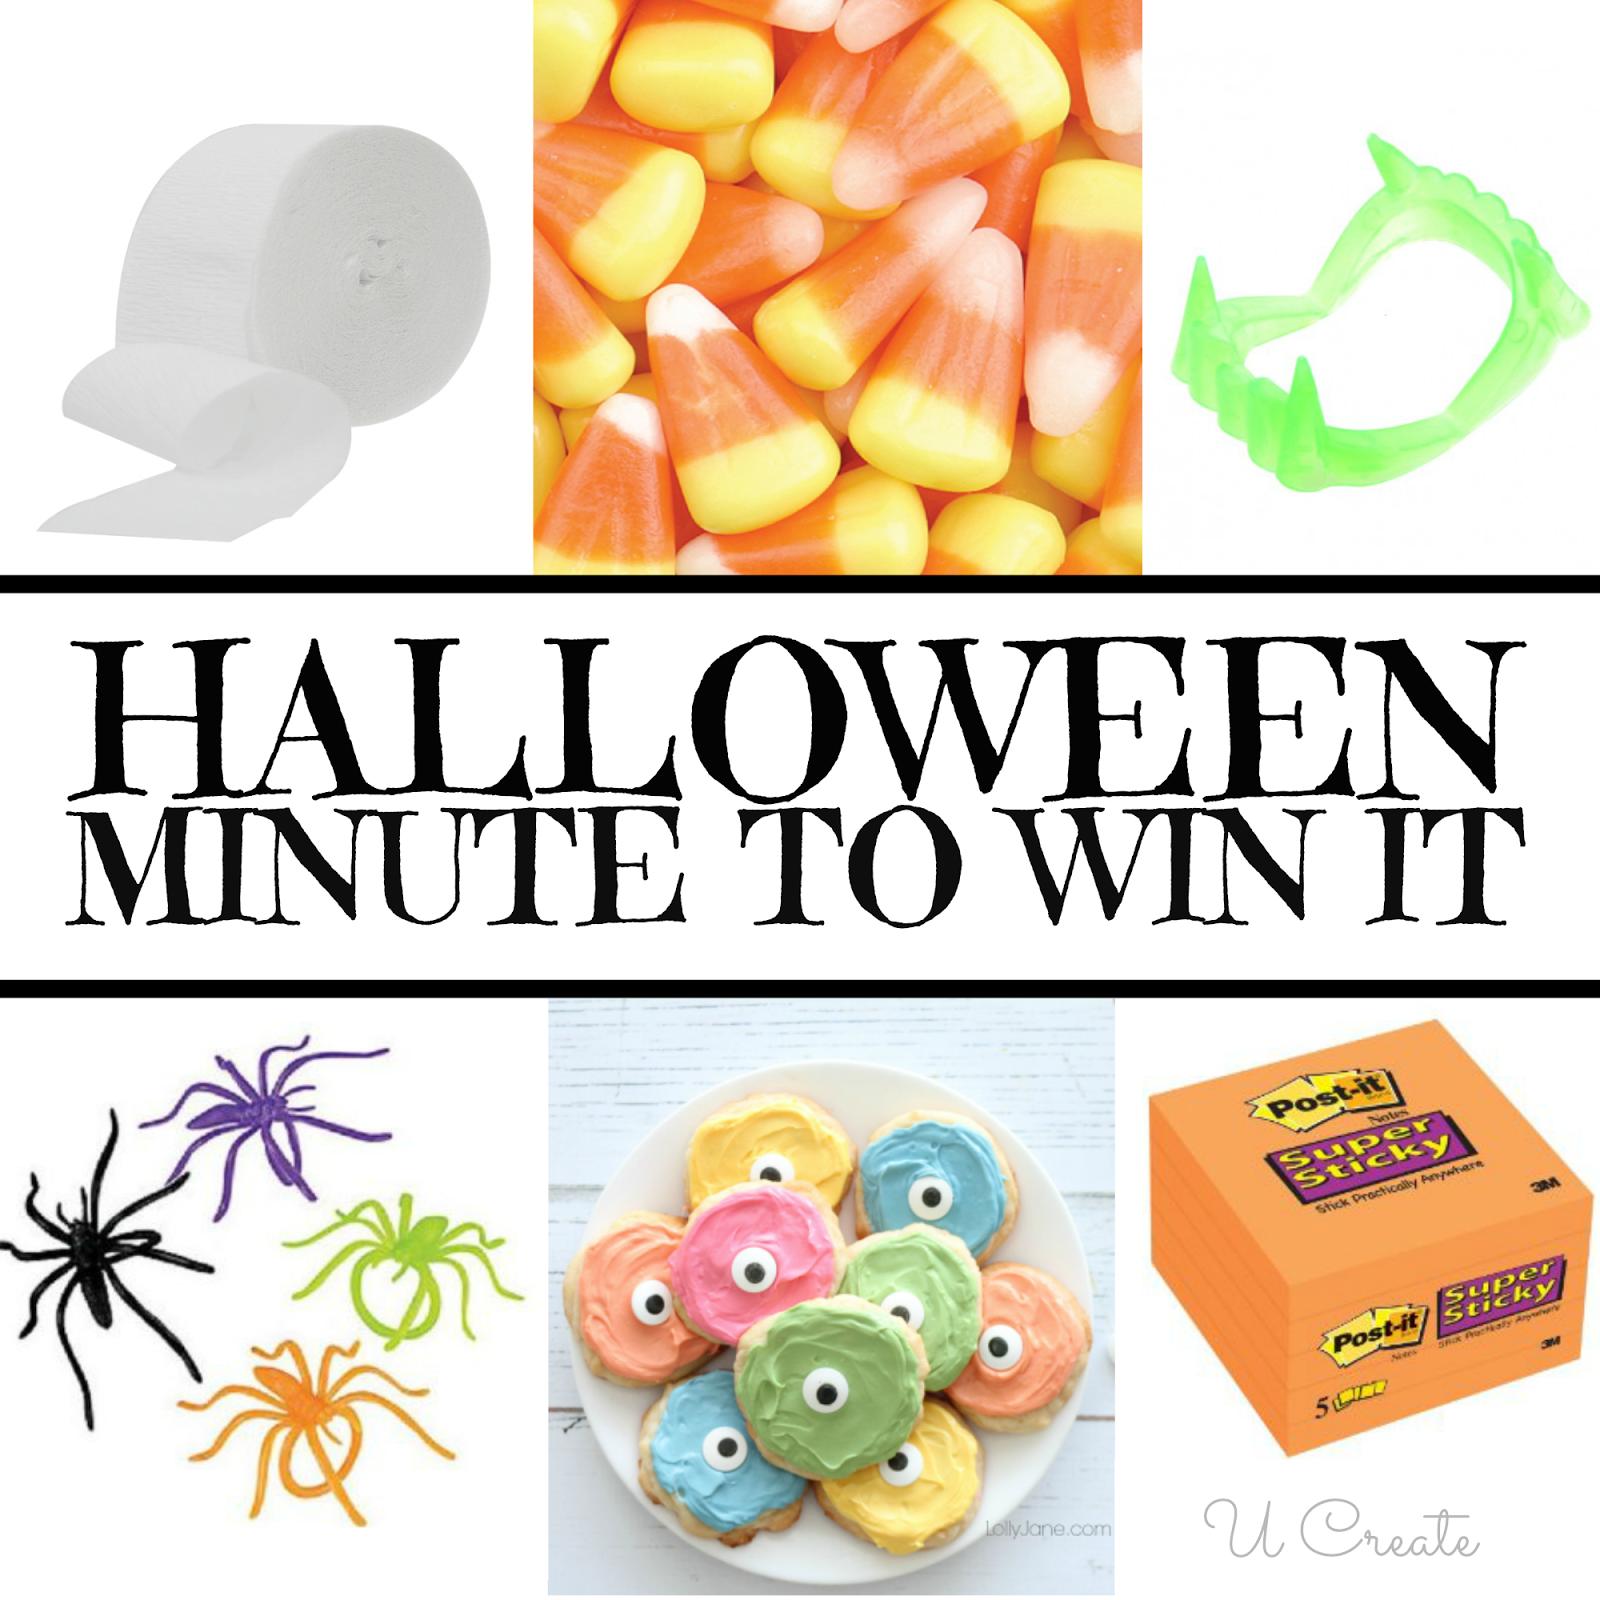 Halloween Minute To Win It Games U Create